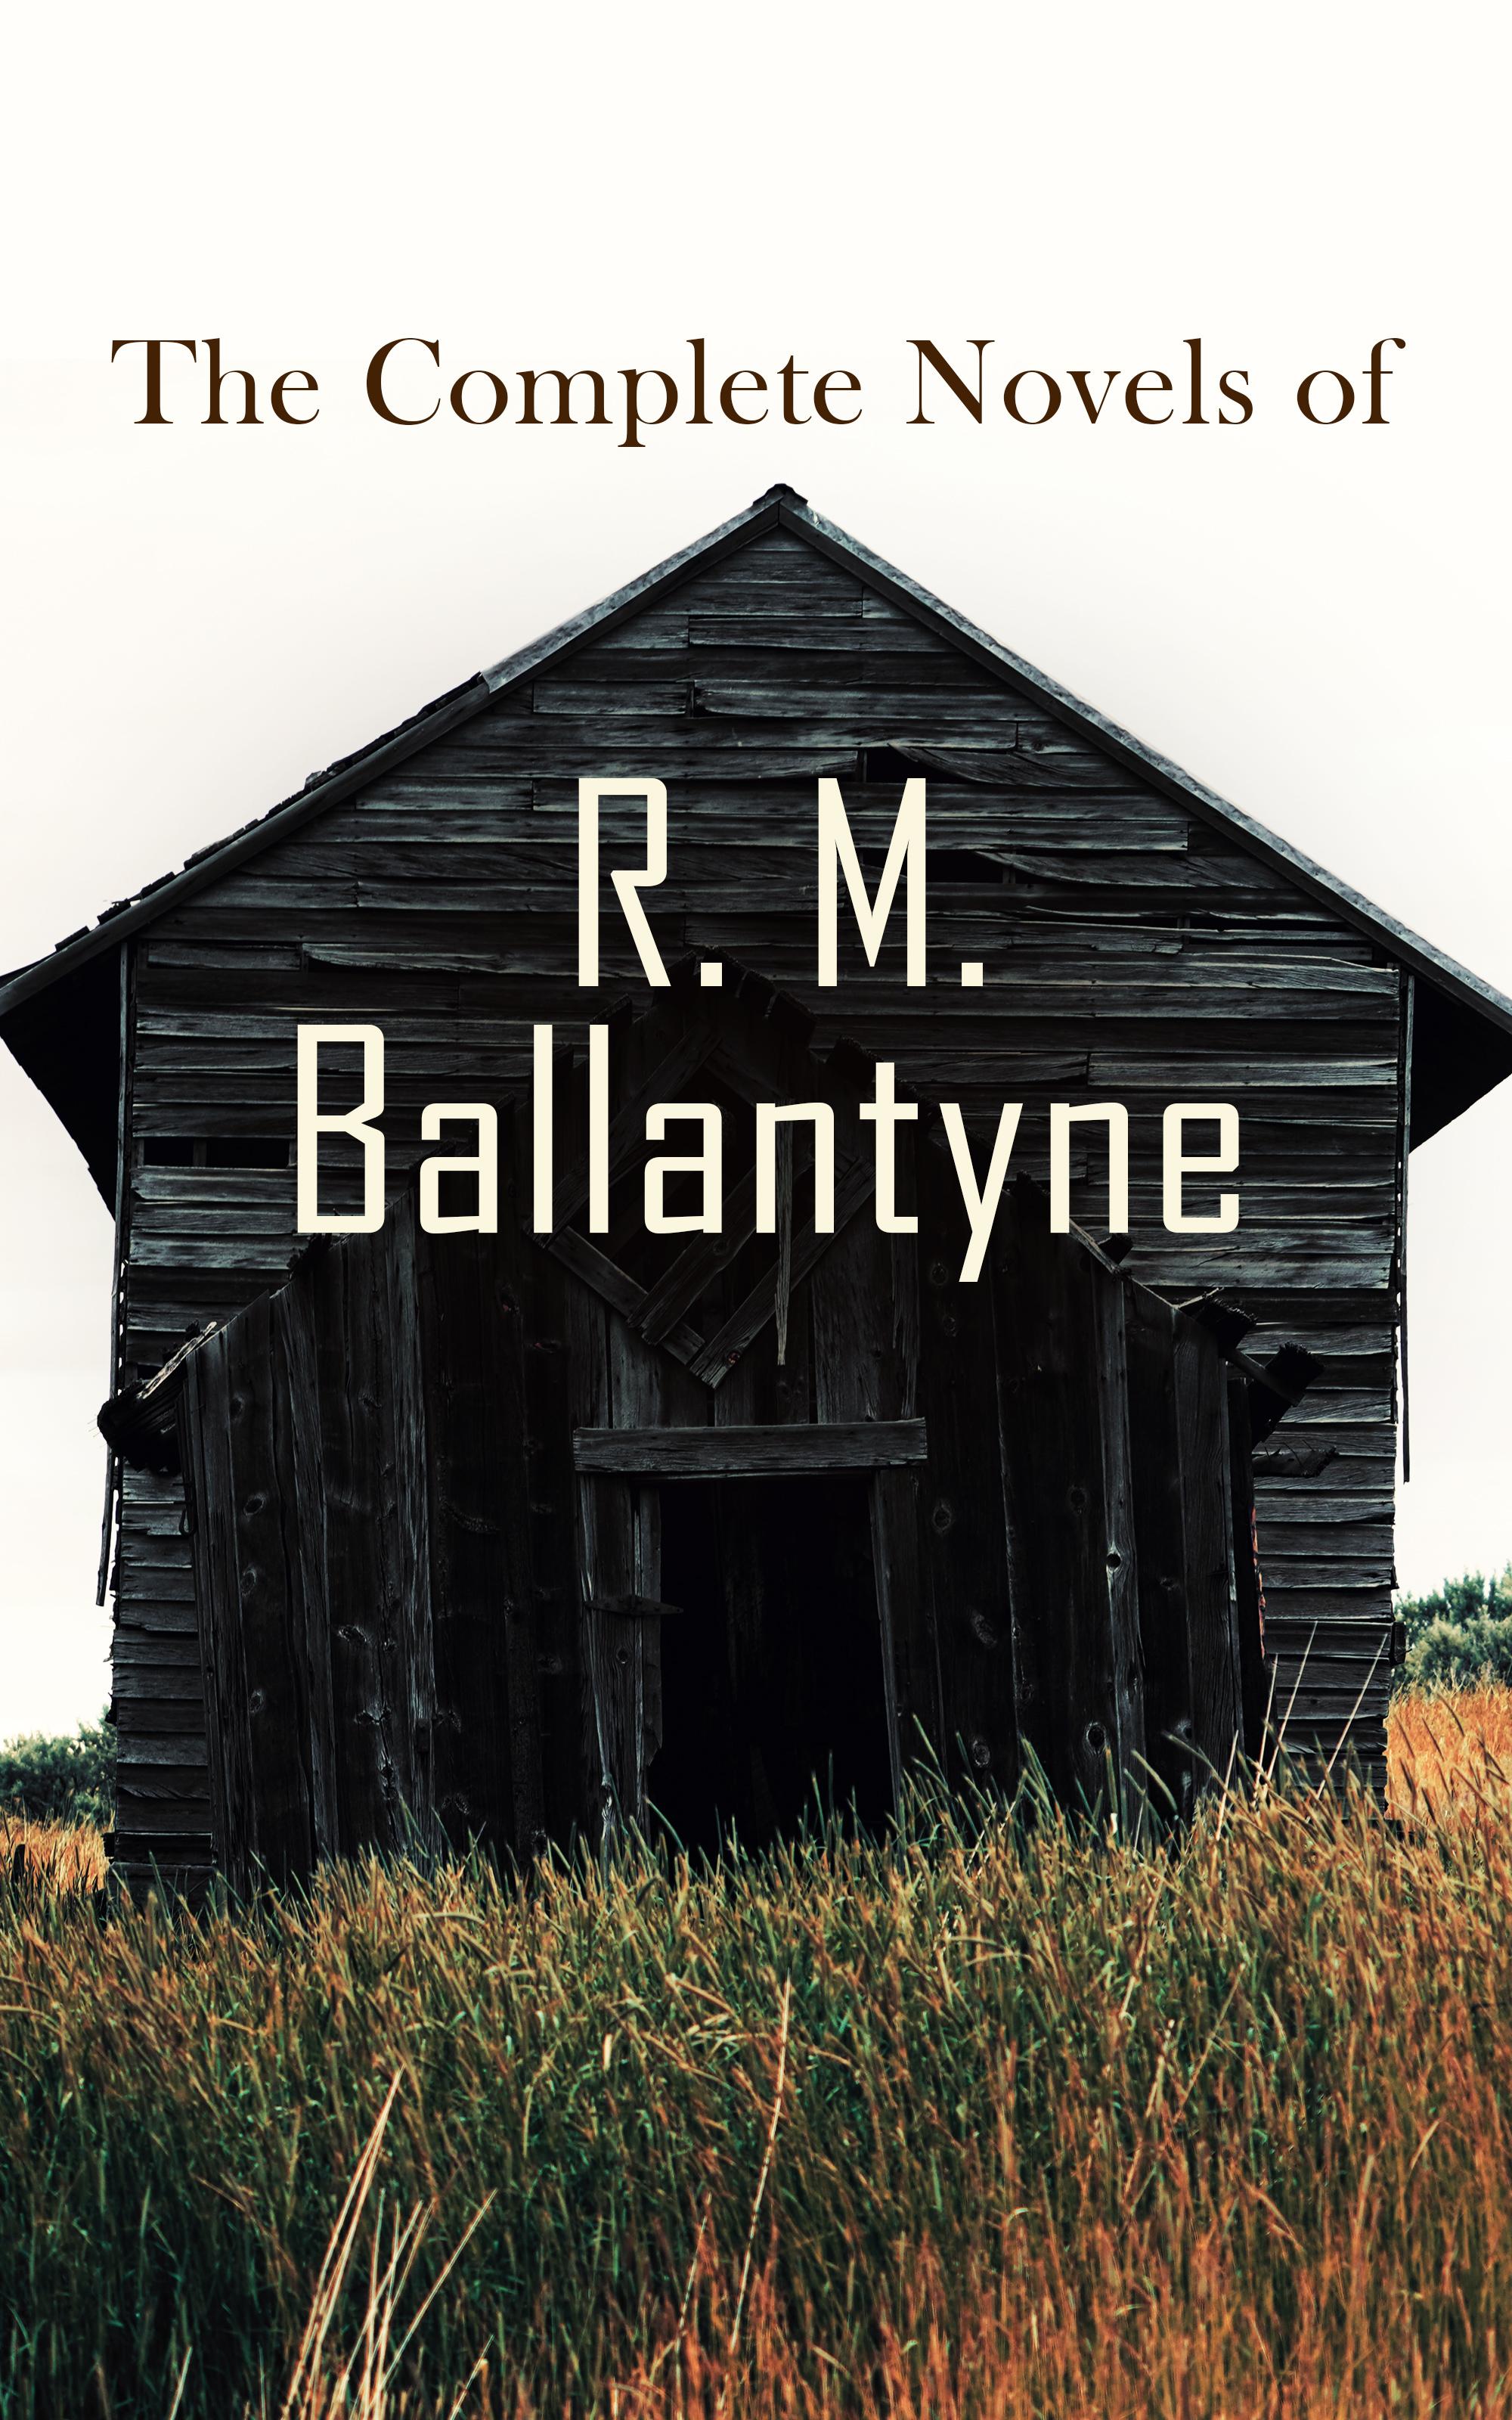 R. M. Ballantyne The Complete Novels of R. M. Ballantyne m r